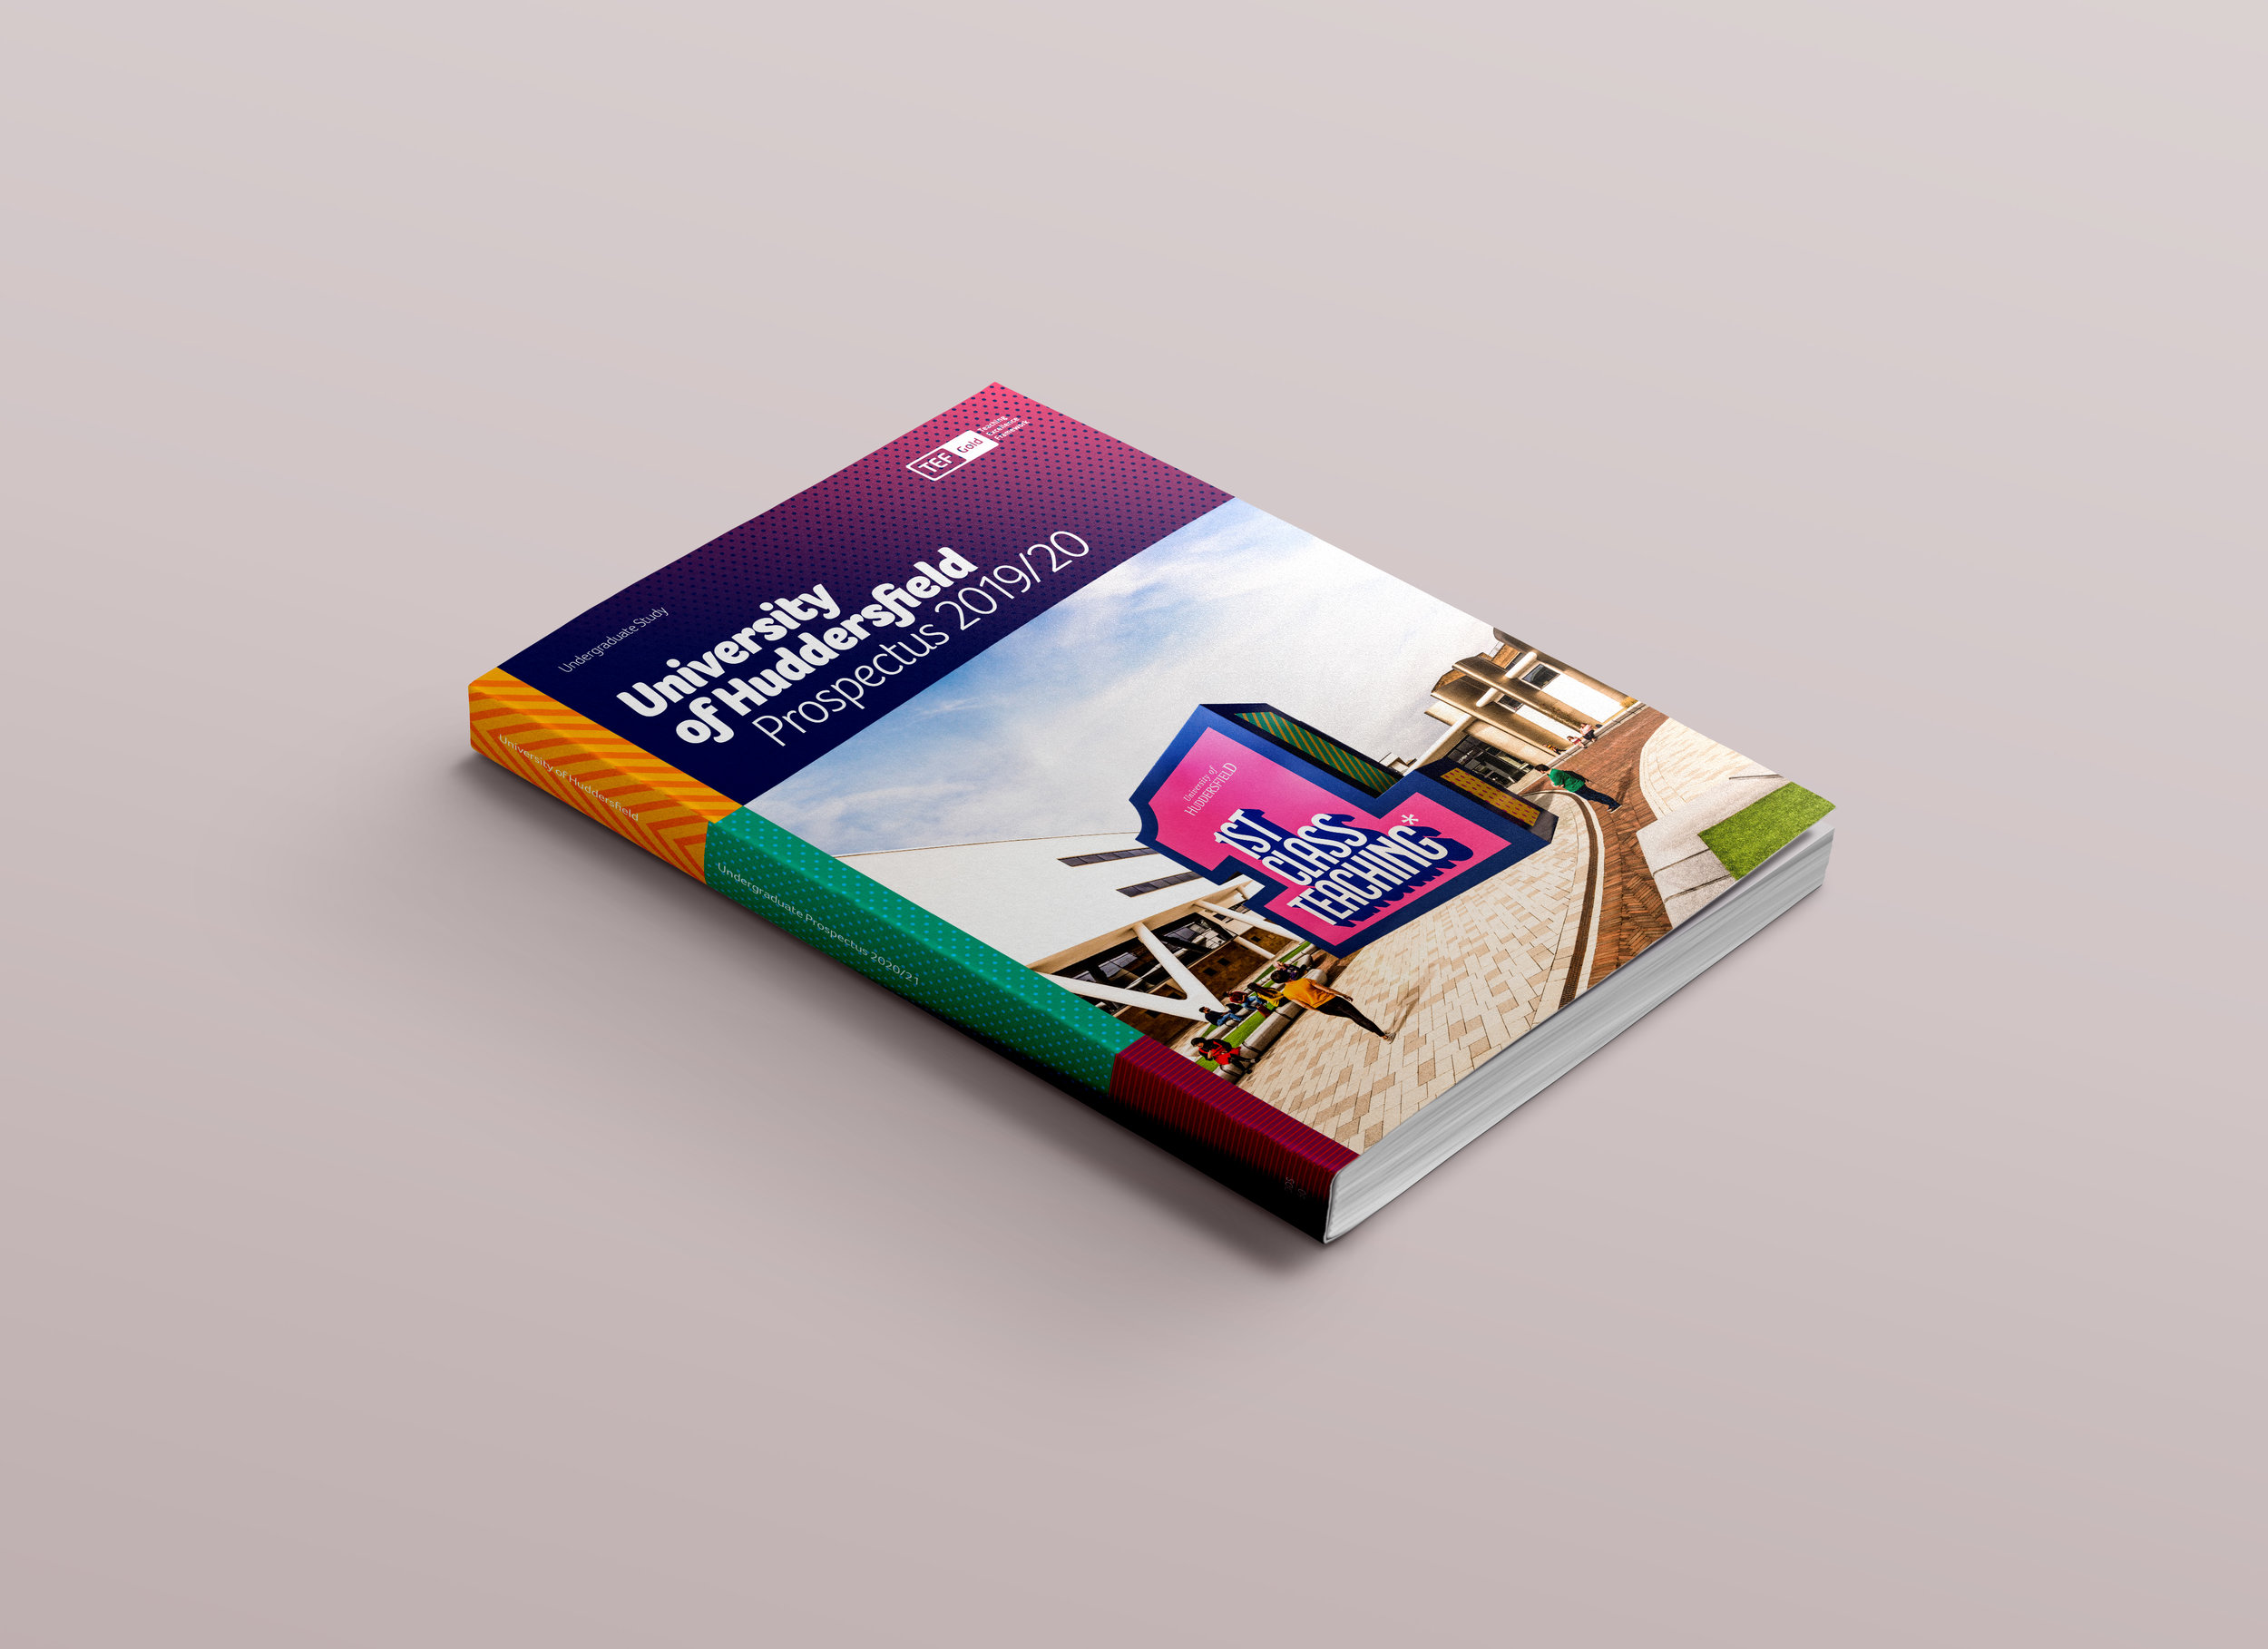 1233_Prospectus_Design_Stg05_COMP.jpg